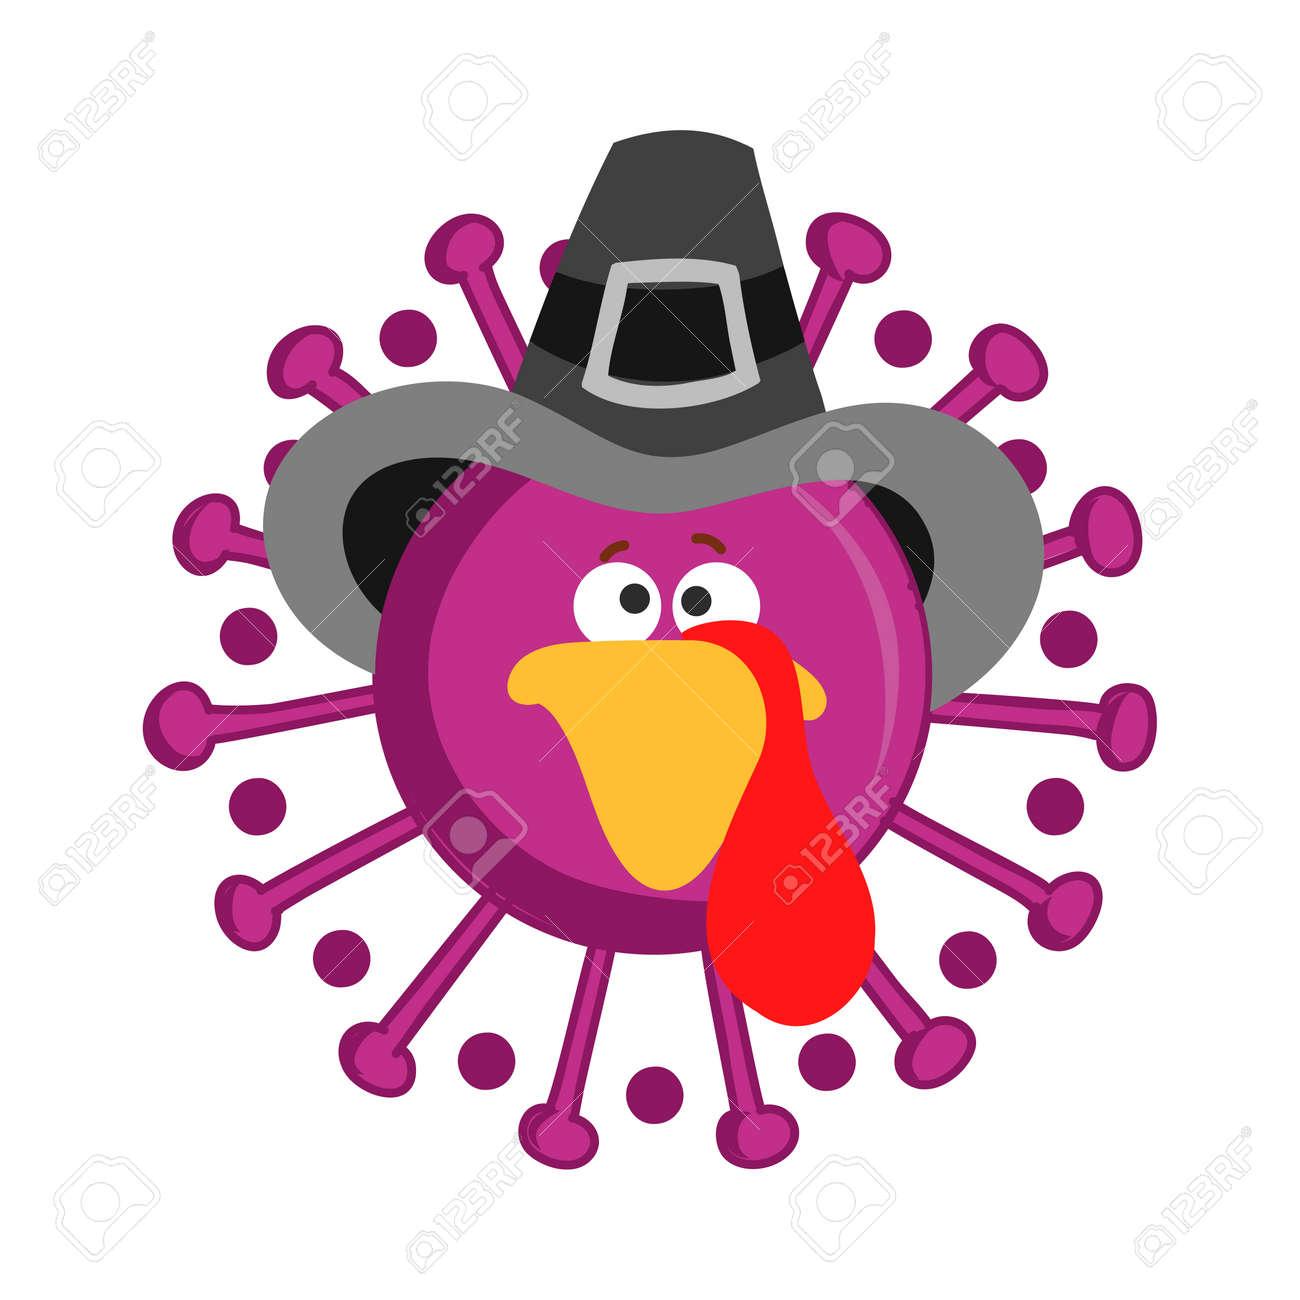 Thanksgiving 2020 turkey face coronavirus - Awareness illustration. Coronavirus (2019-nCoV) Concept of self isolation times. Covid-19 souvenir - 158617460